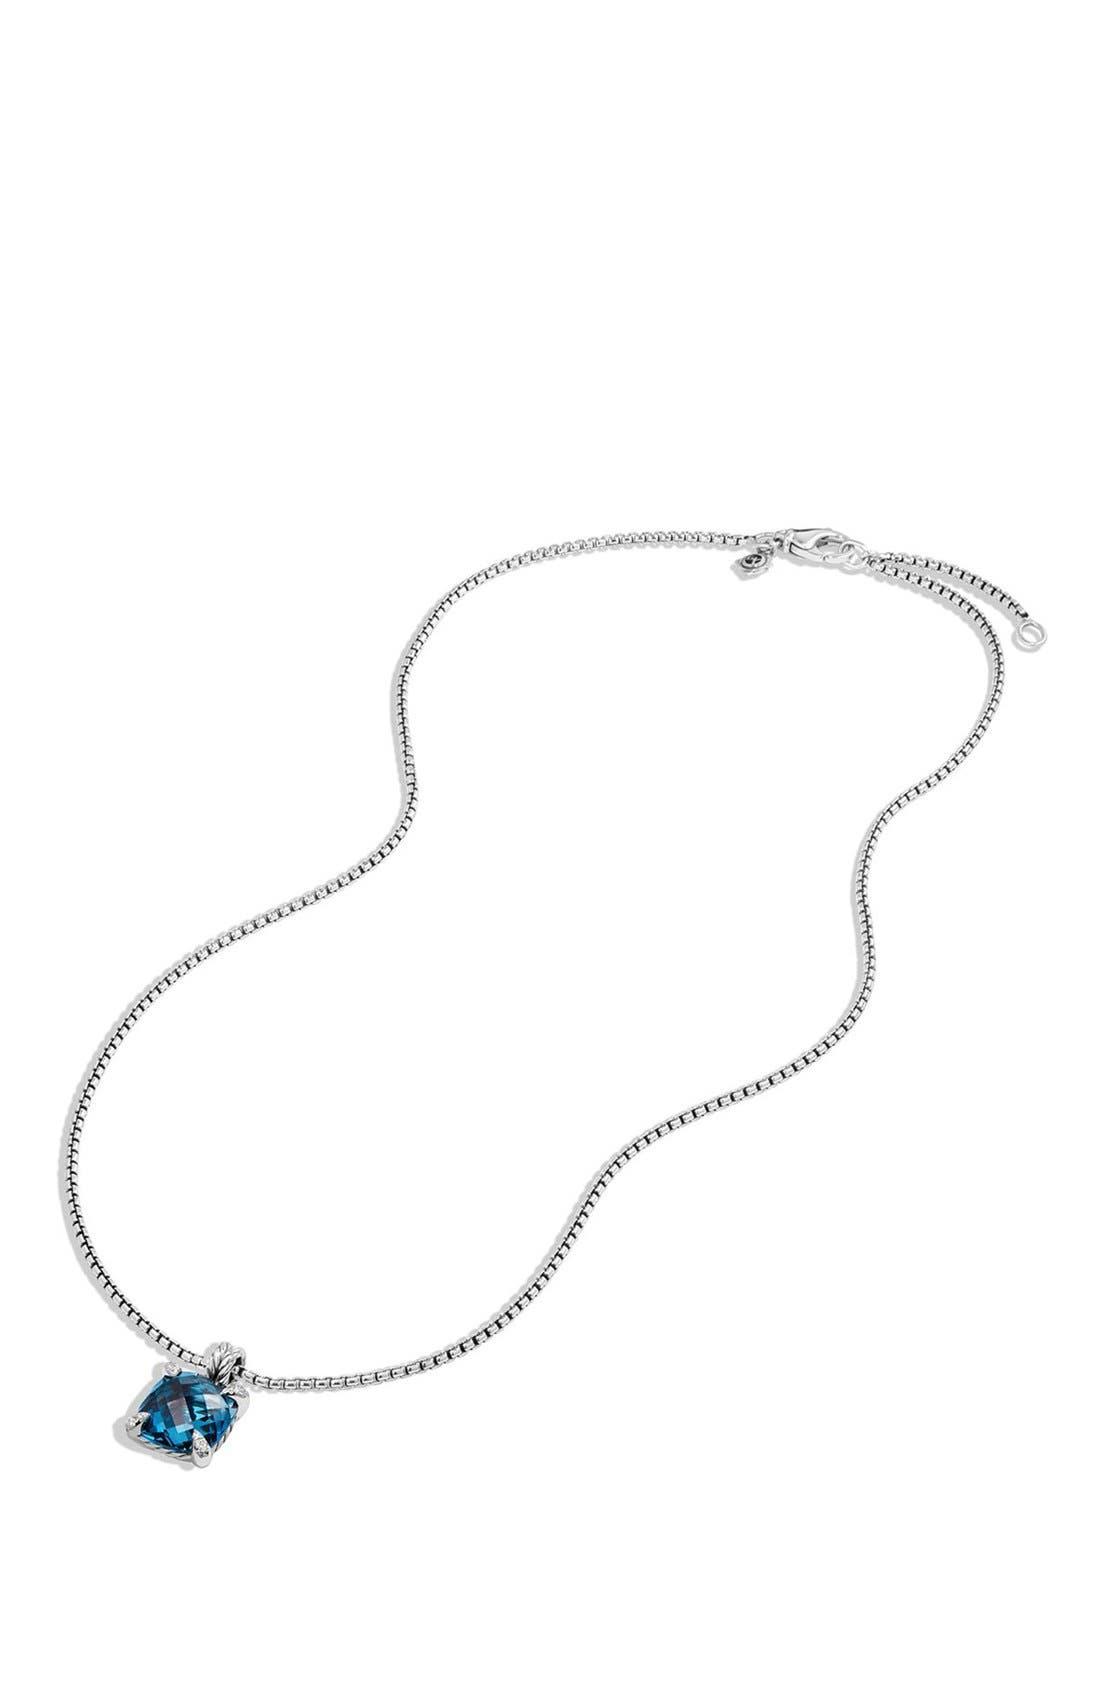 'Châtelaine' Pendant Necklace with Semiprecious Stone & Diamonds,                             Alternate thumbnail 3, color,                             SILVER/ HAMPTON BLUE TOPAZ